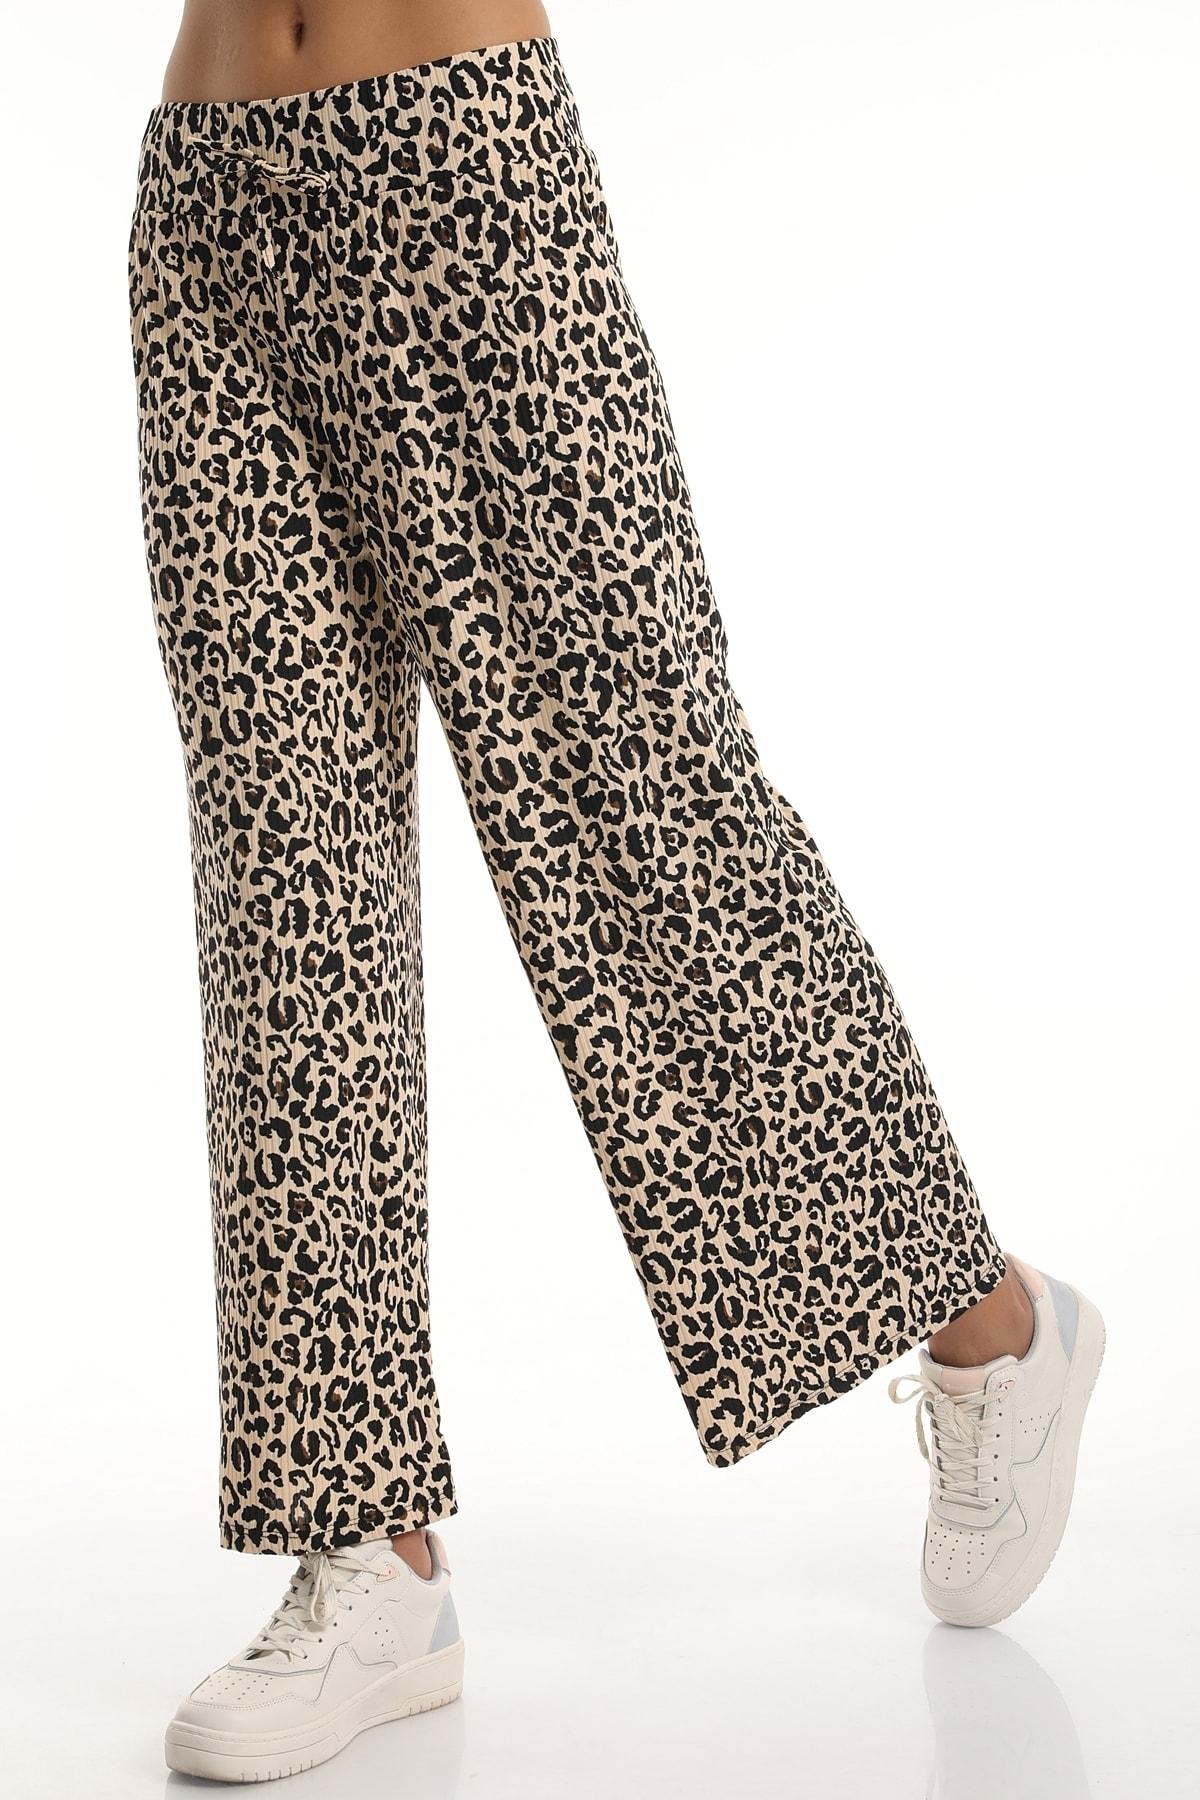 MD trend Kadın Bel Lastikli Salaş Bol Paça Pantolon/leopar/s 2